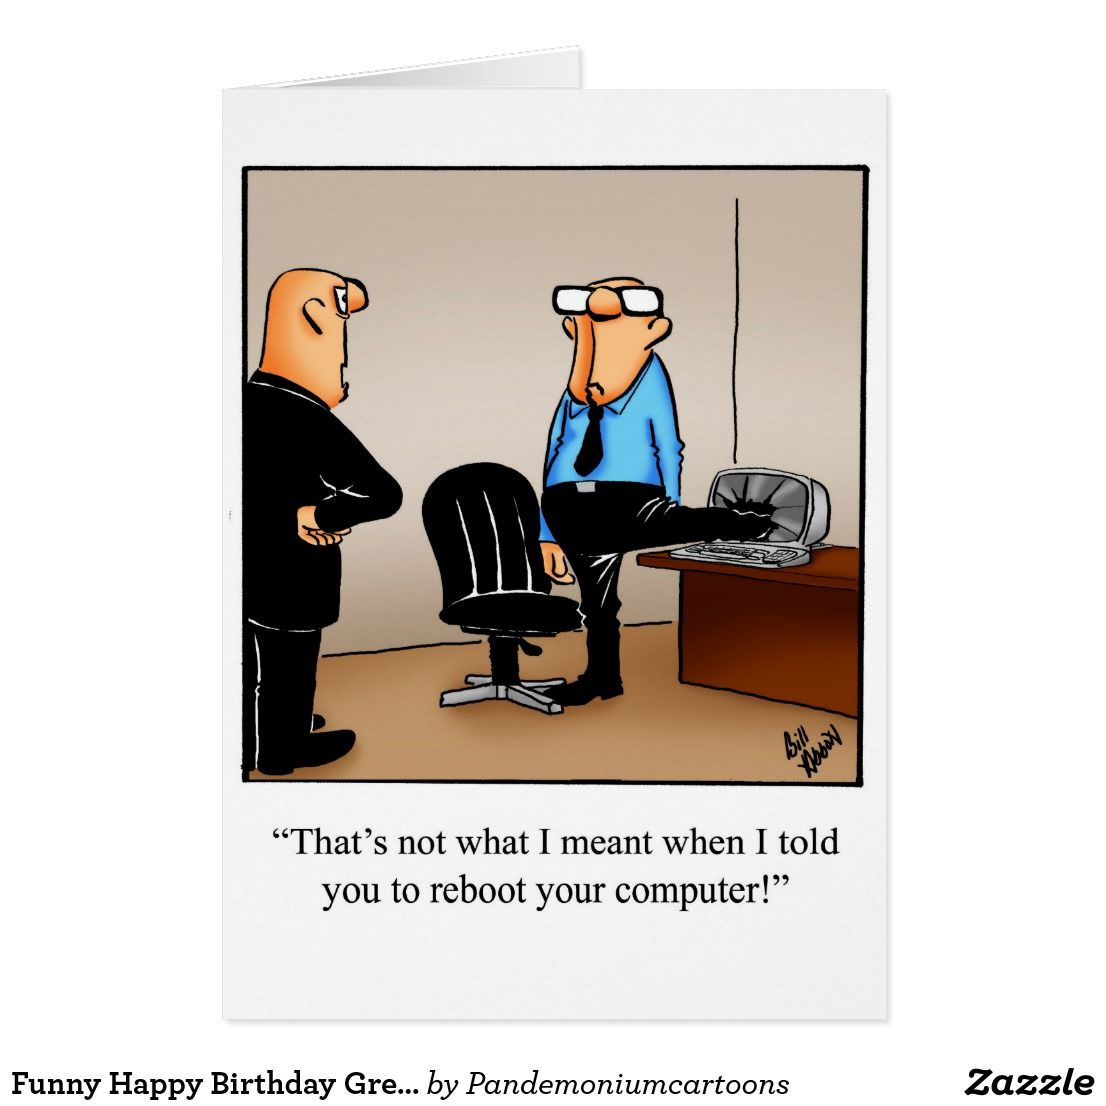 Funny Happy Birthday Greeting Card Zazzle Com In 2021 Funny Happy Birthday Greetings Cartoon Jokes Nerd Humor